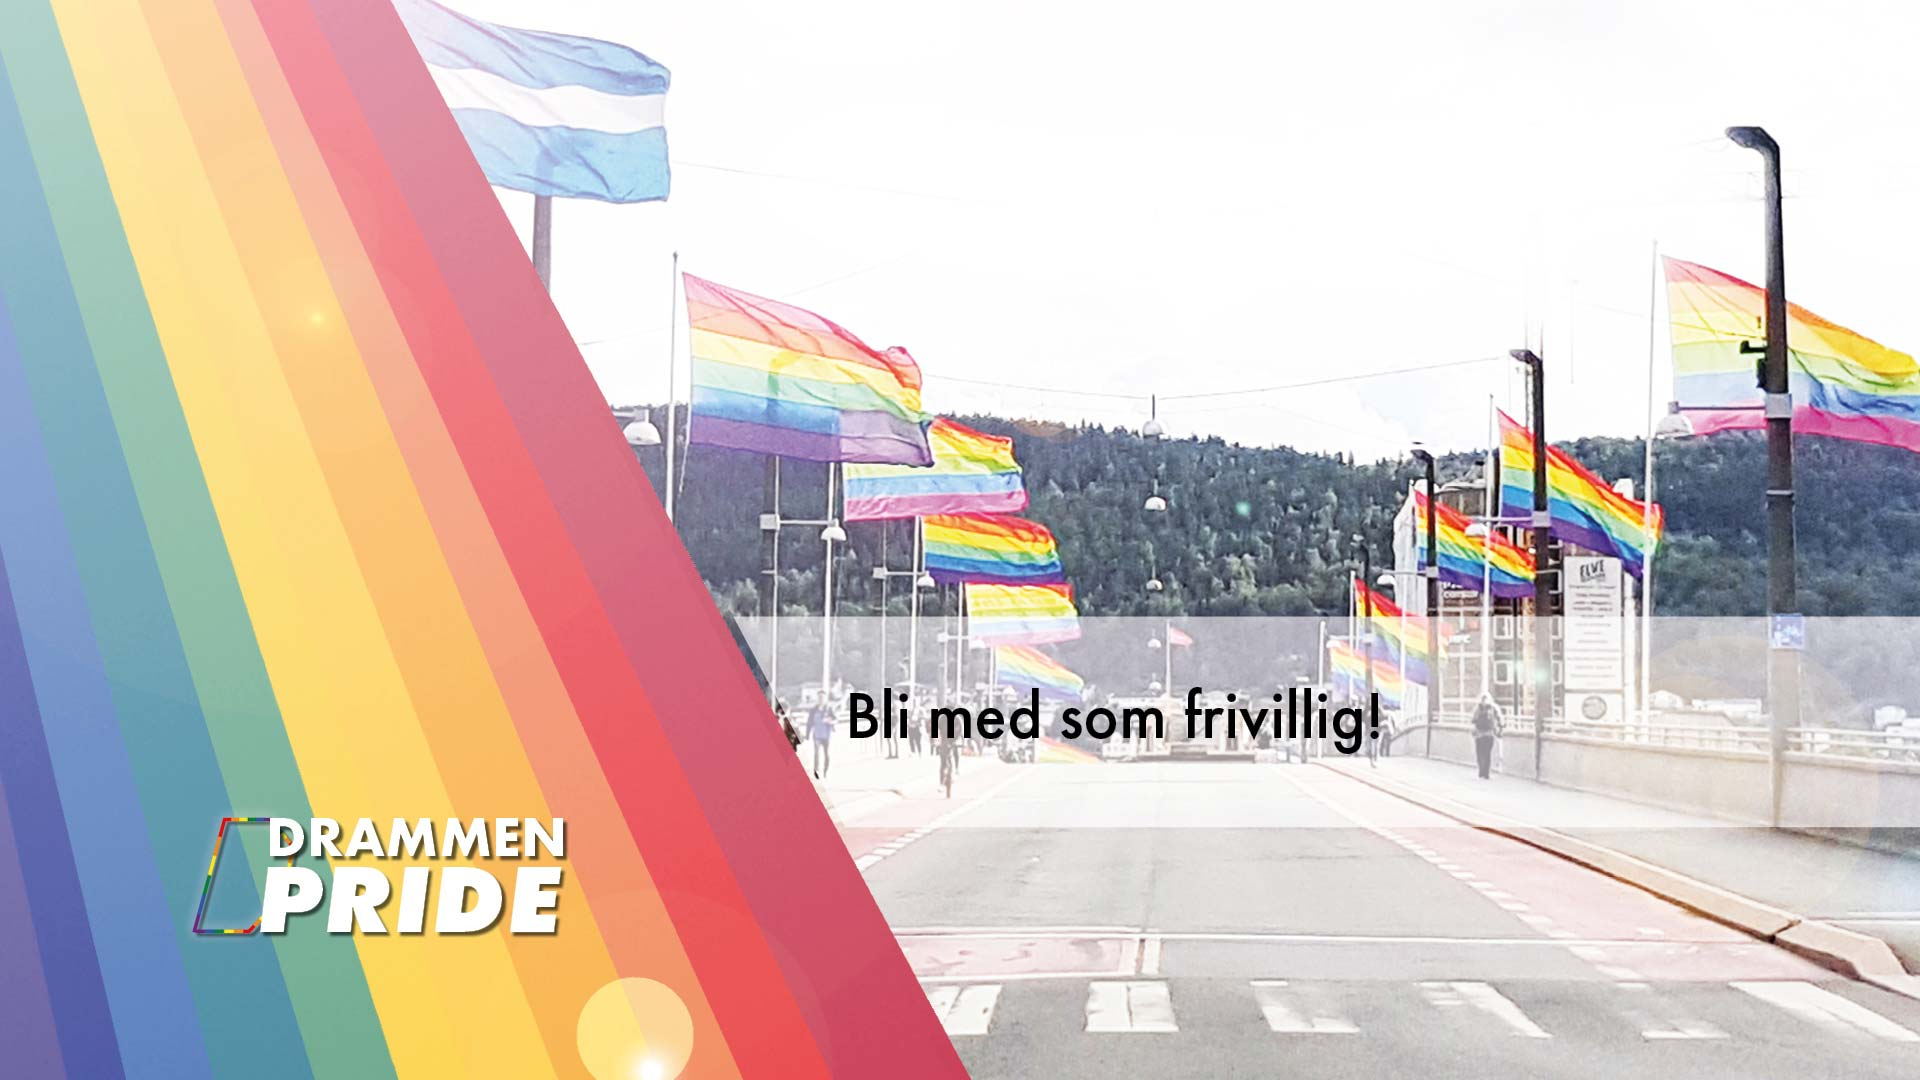 Bli frivillig i Drammen Pride